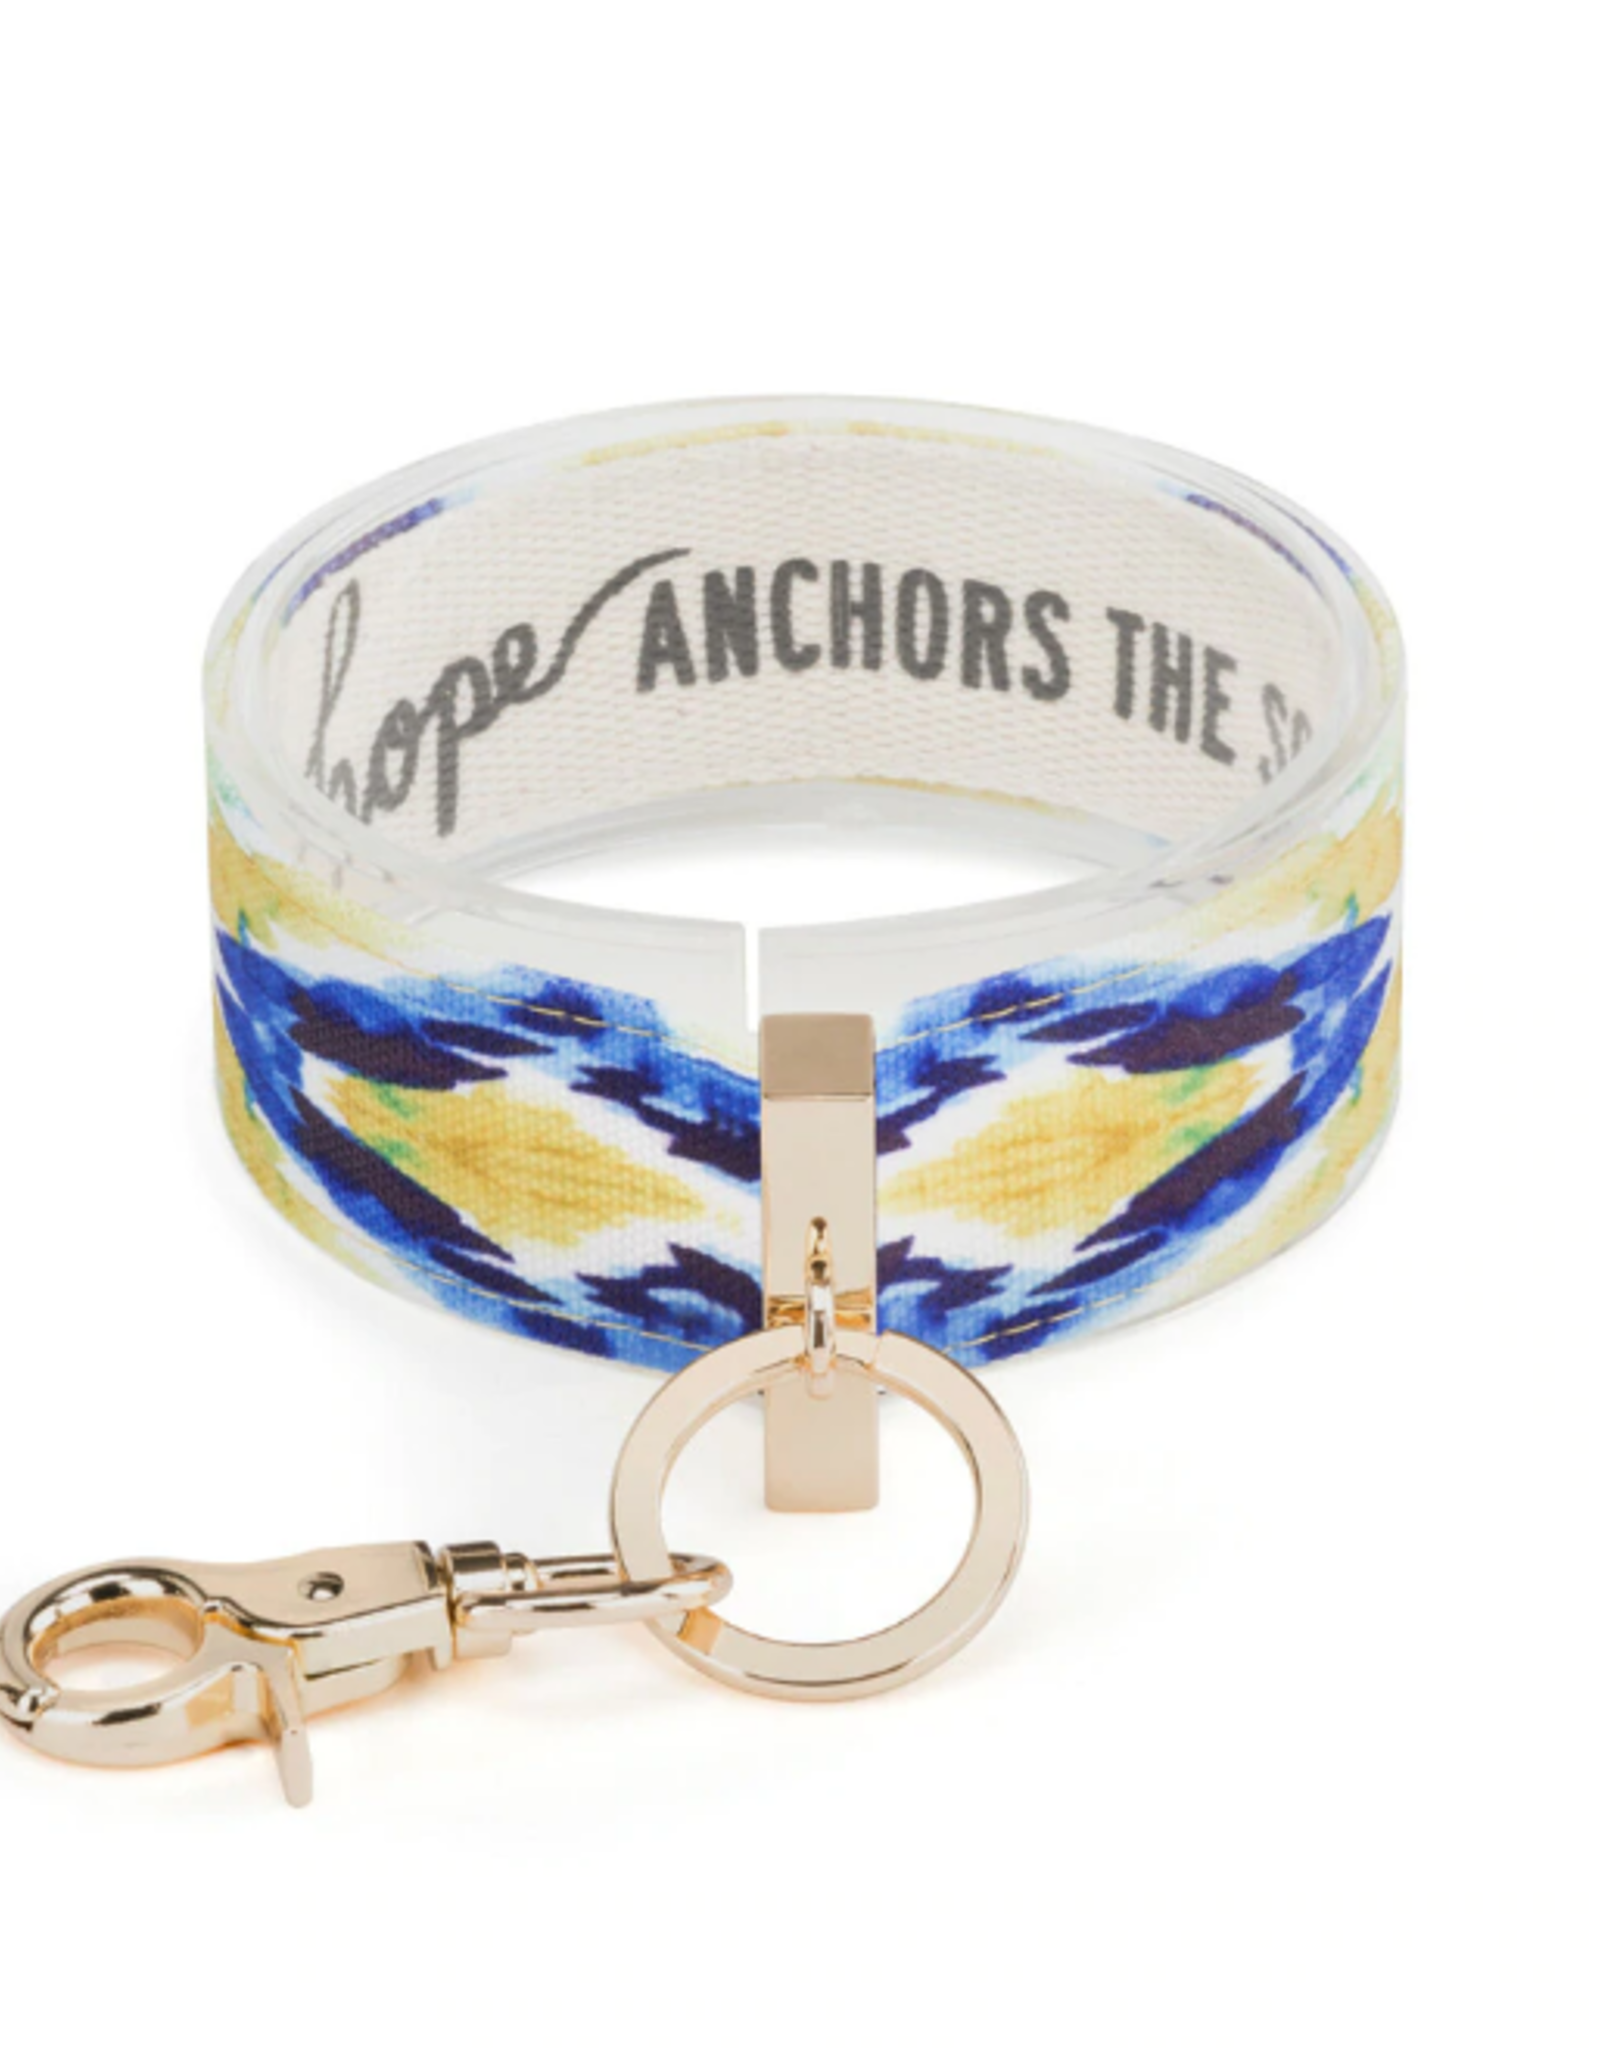 Wrist Strap Key Chain, Hope Anchors the Soul